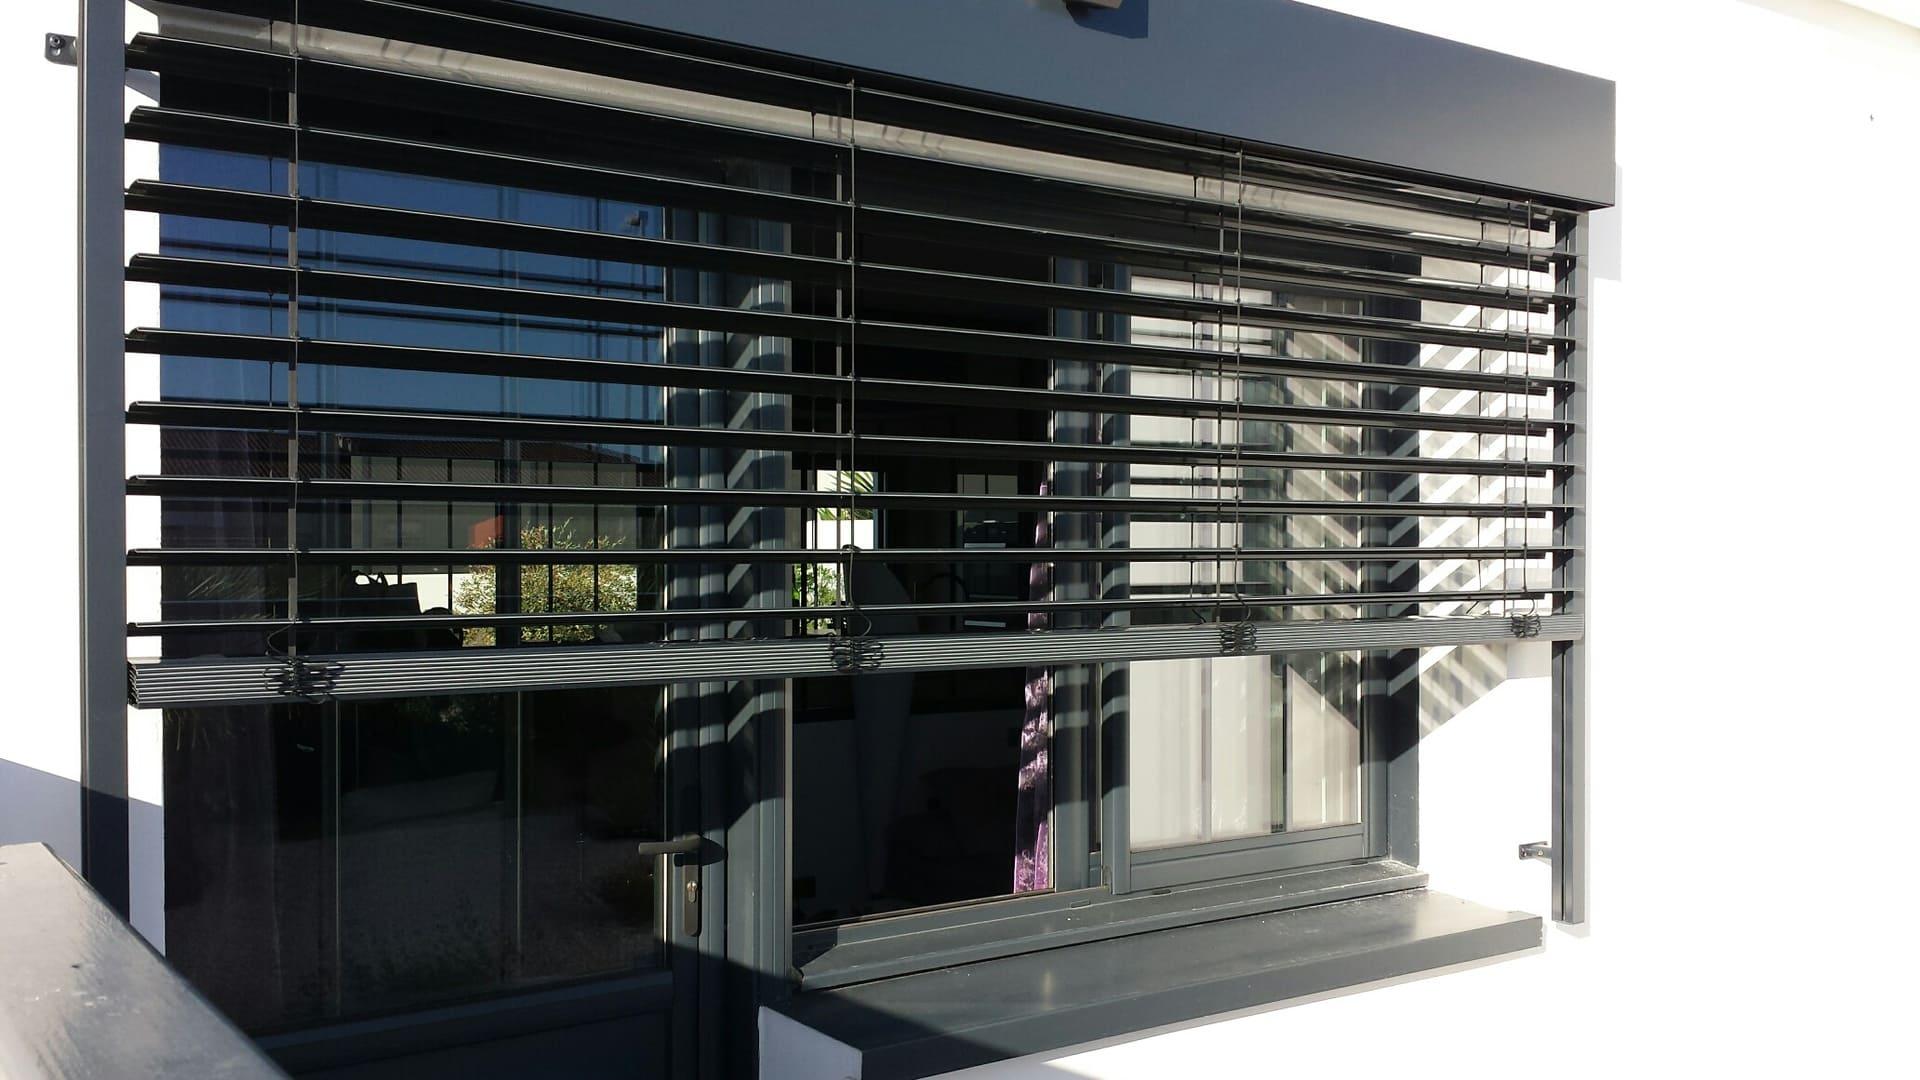 Brise soleil orientable en façade